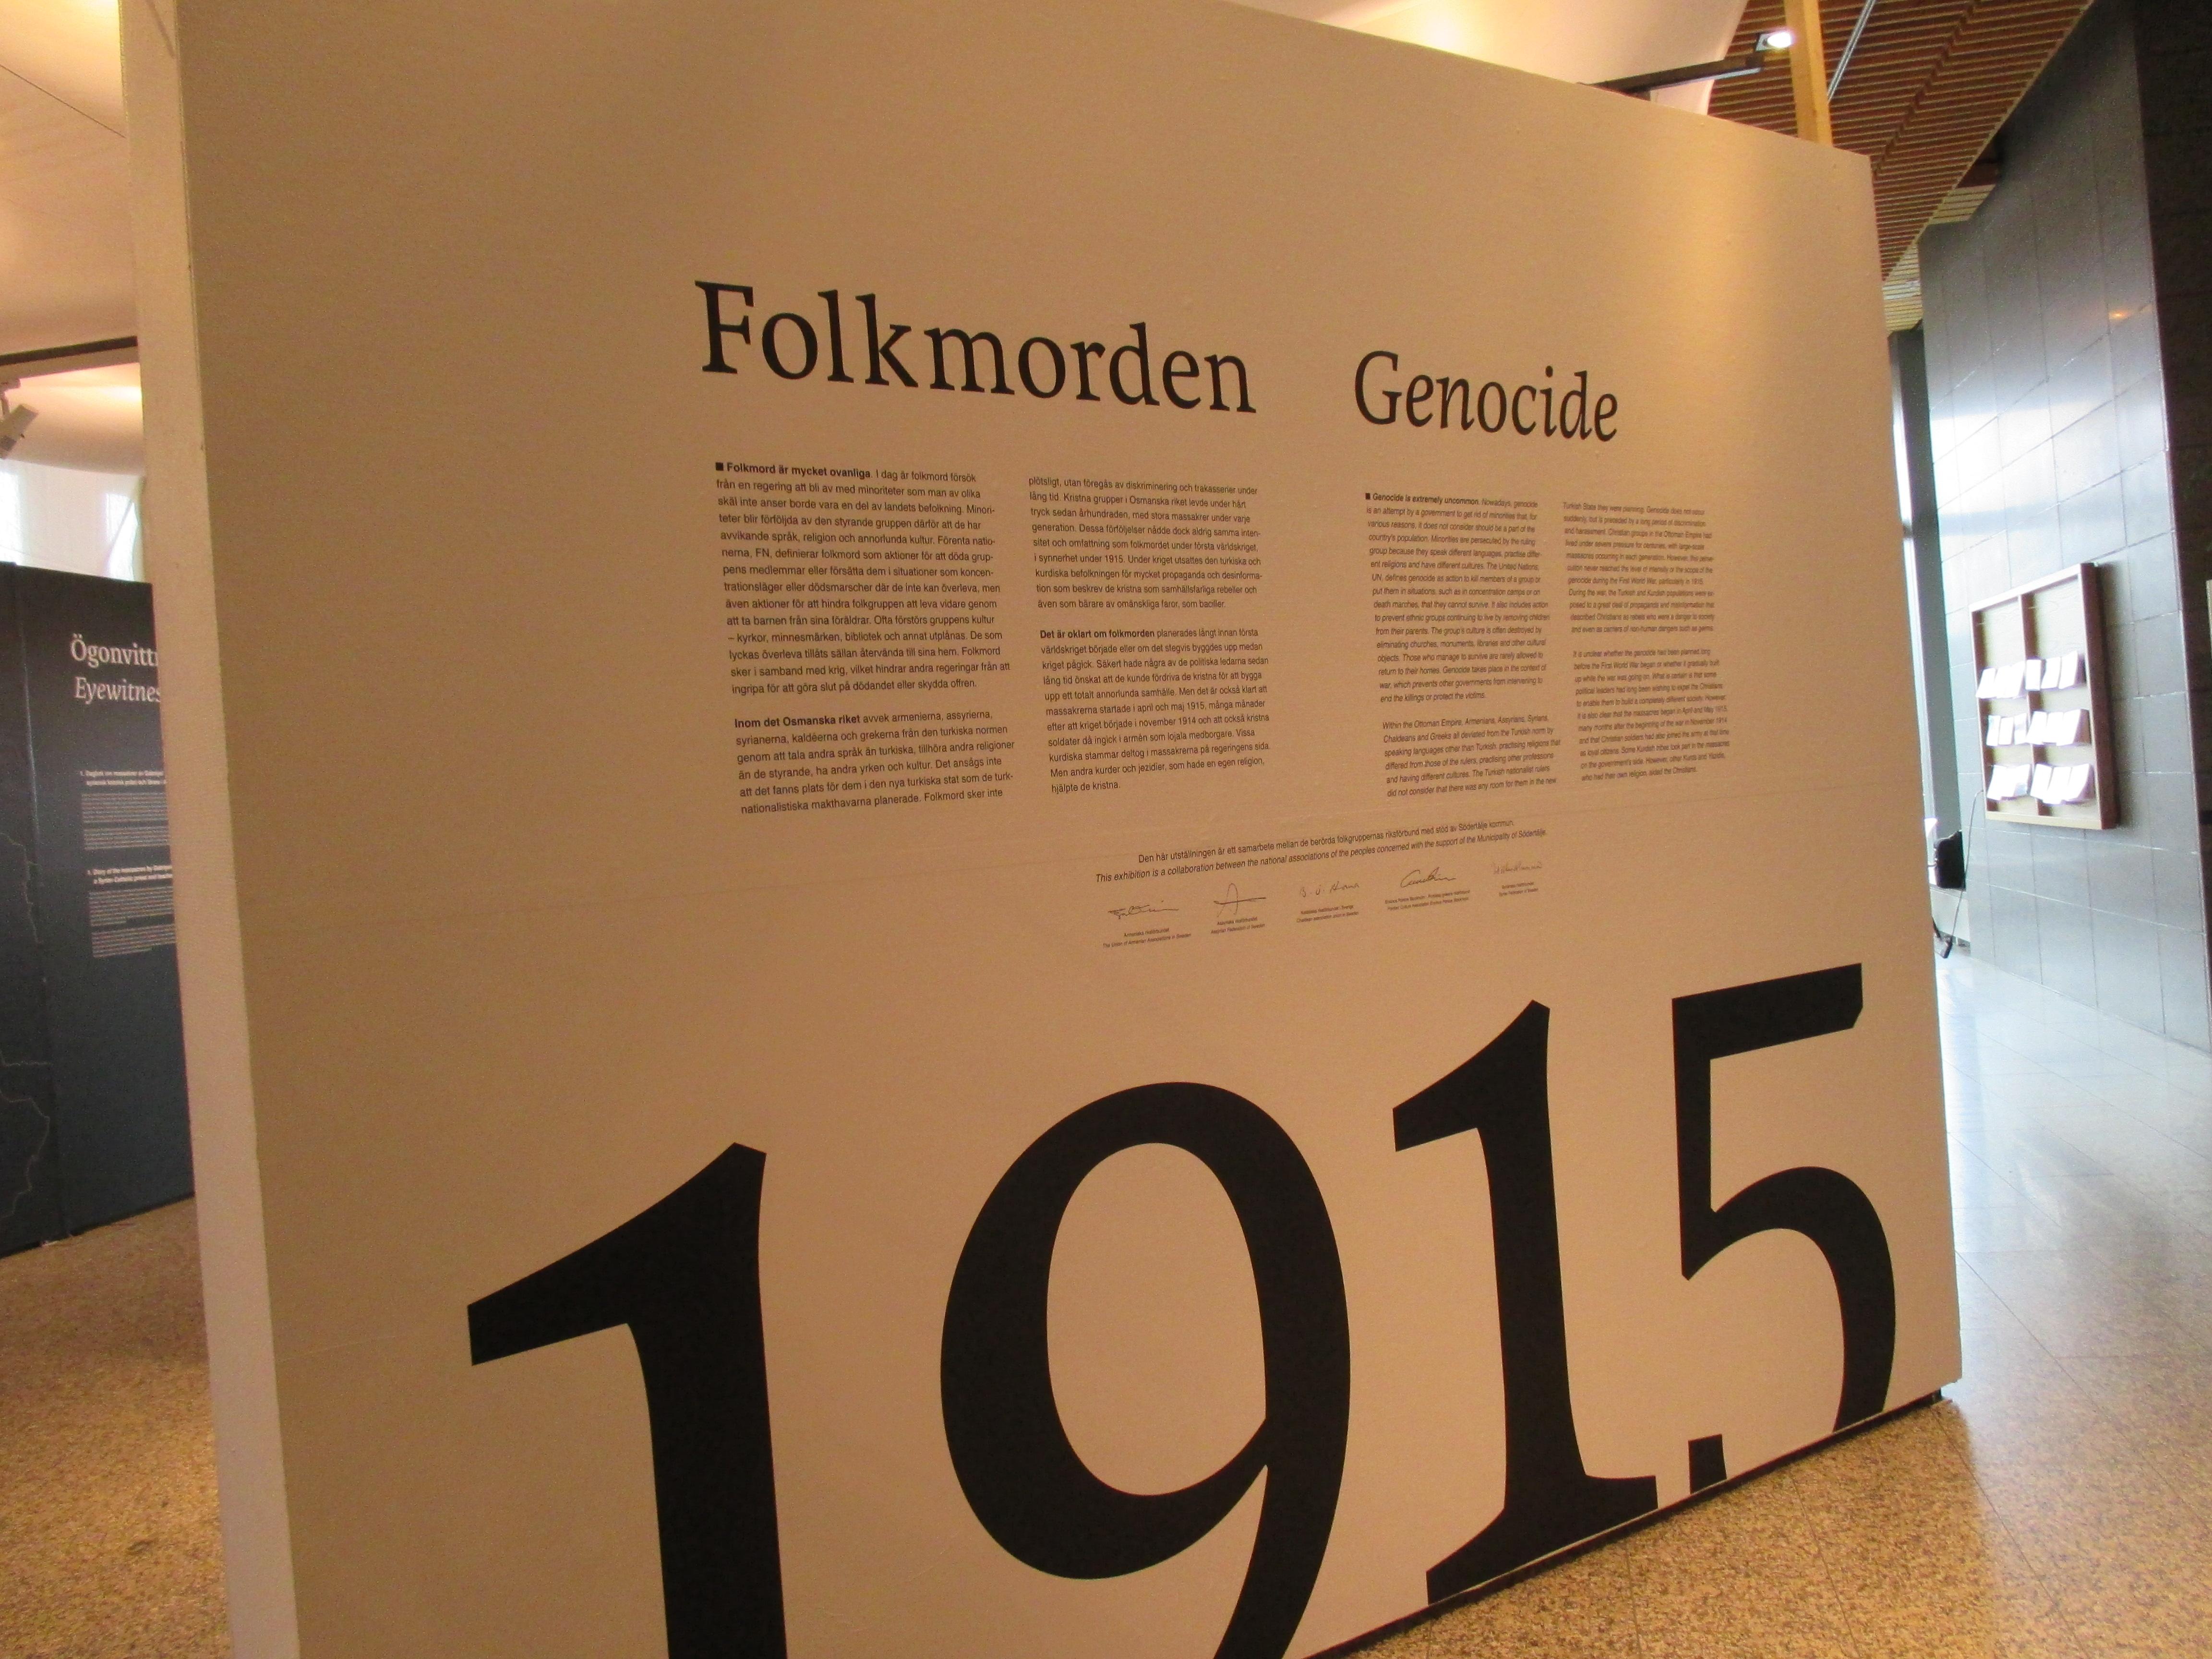 Inget folkmord i balkankrig